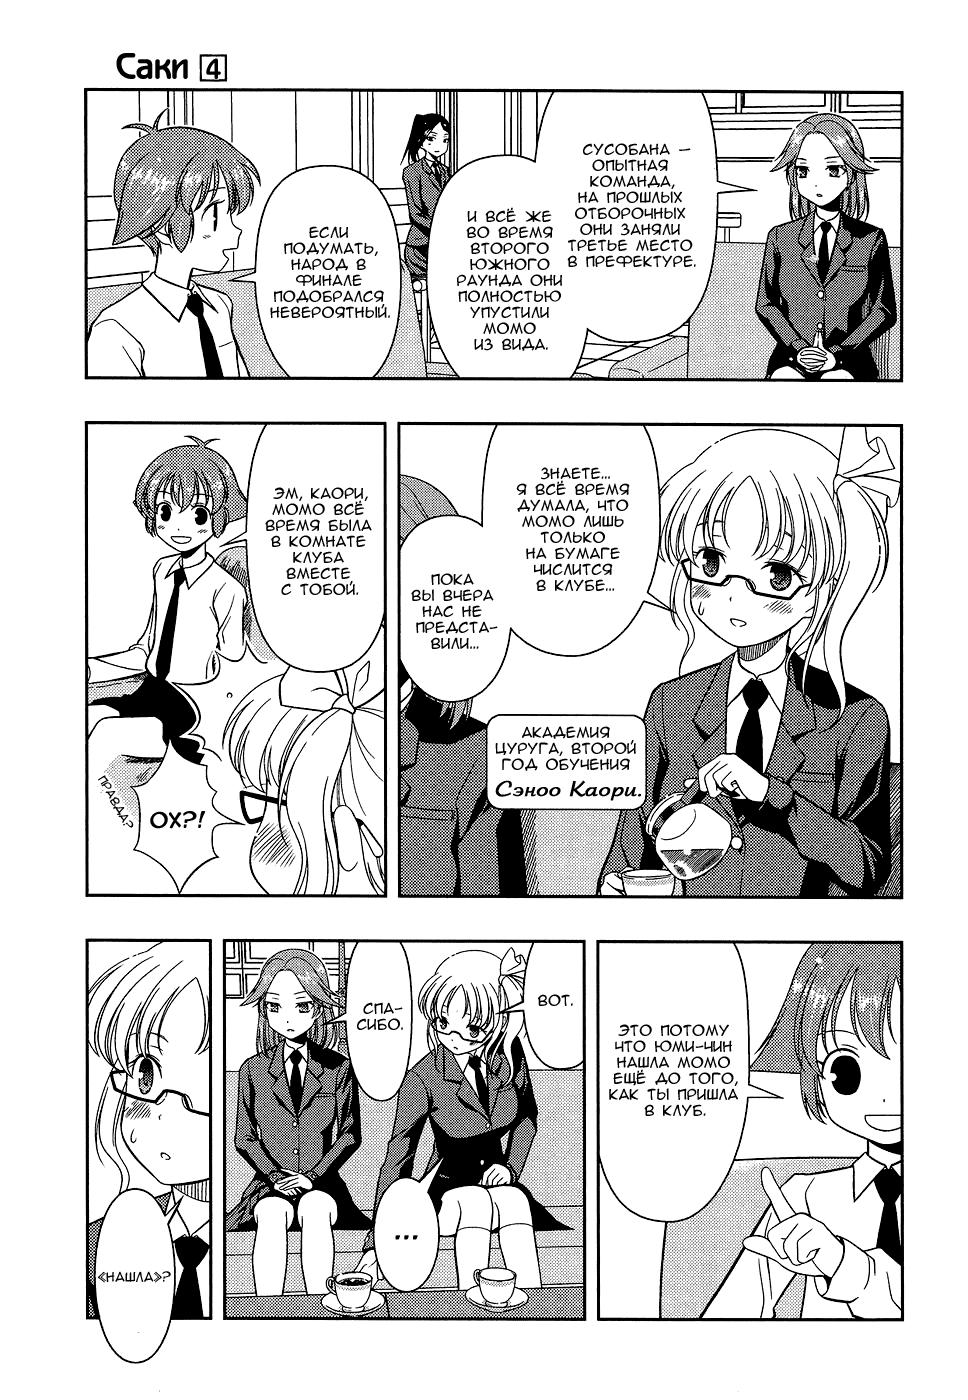 https://r1.ninemanga.com/comics/pic2/33/21665/216016/1428337460704.jpg Page 4